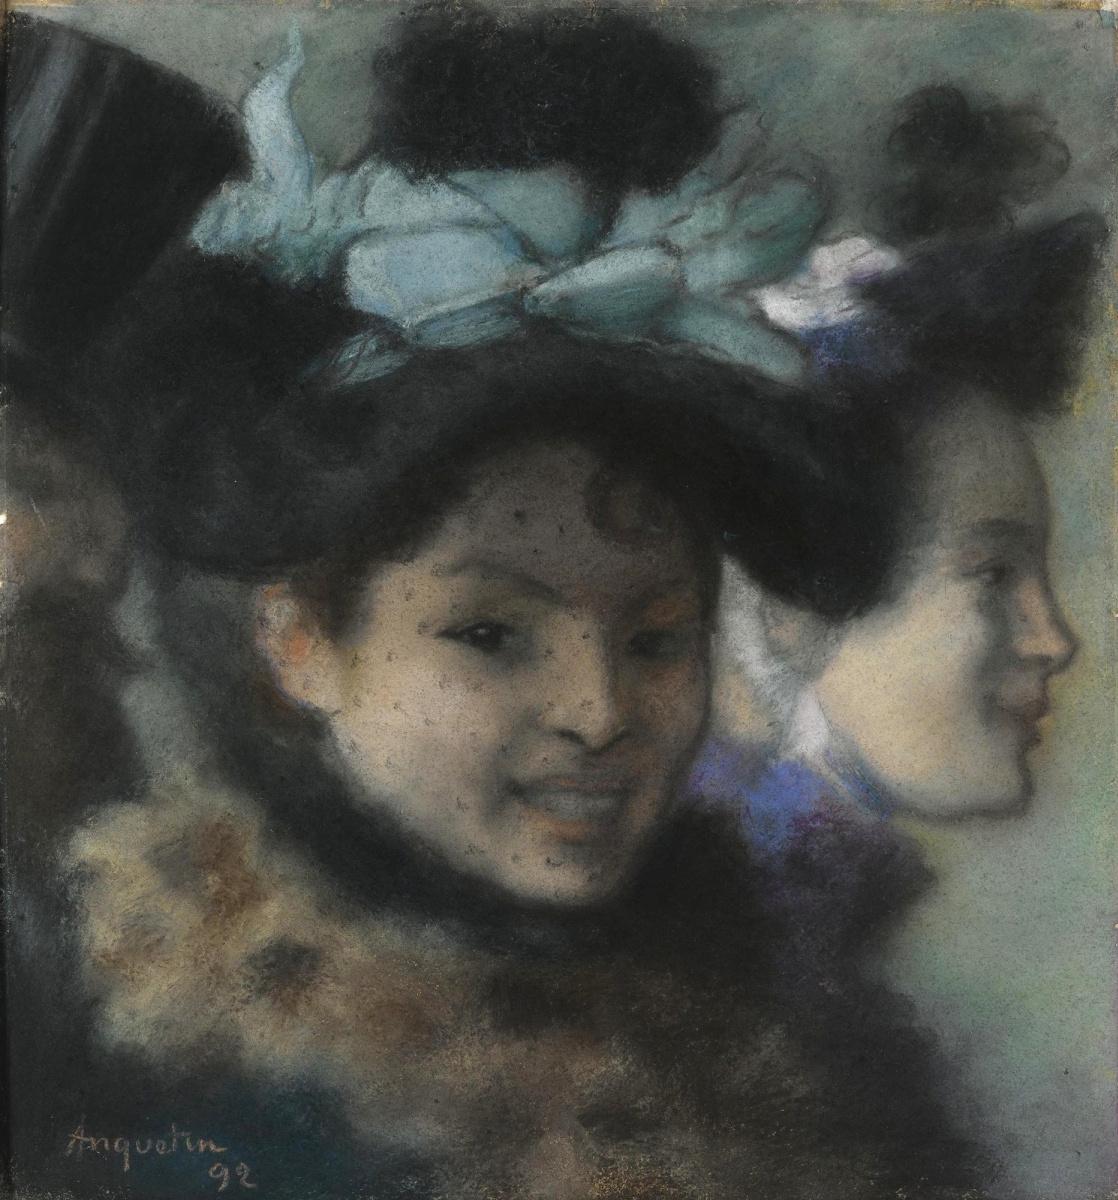 Луи Анкетен. Две женщины и мужчина. 1892